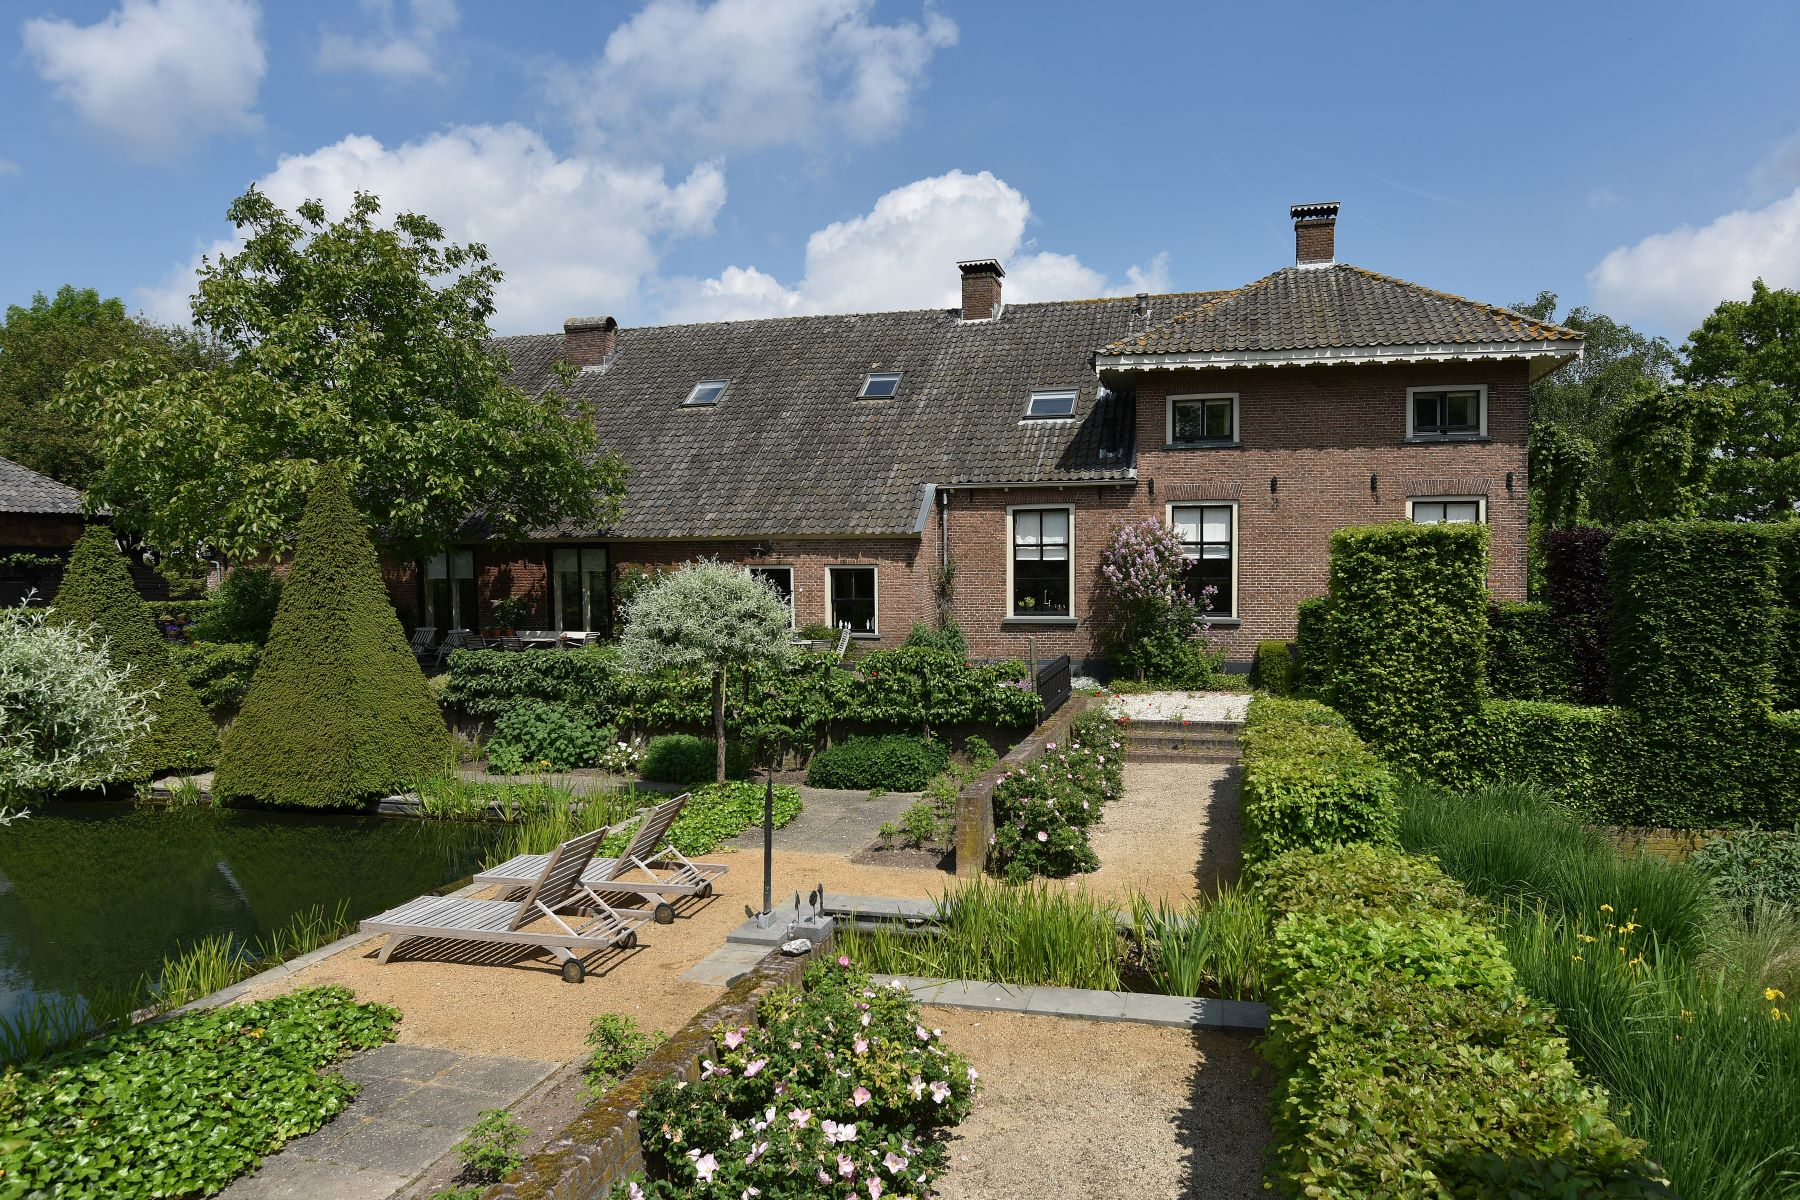 Single Family Homes for Sale at FARMHOUSE BUITENLUST Achterstraat 11 Asch, Gelderland 4115 RP Netherlands